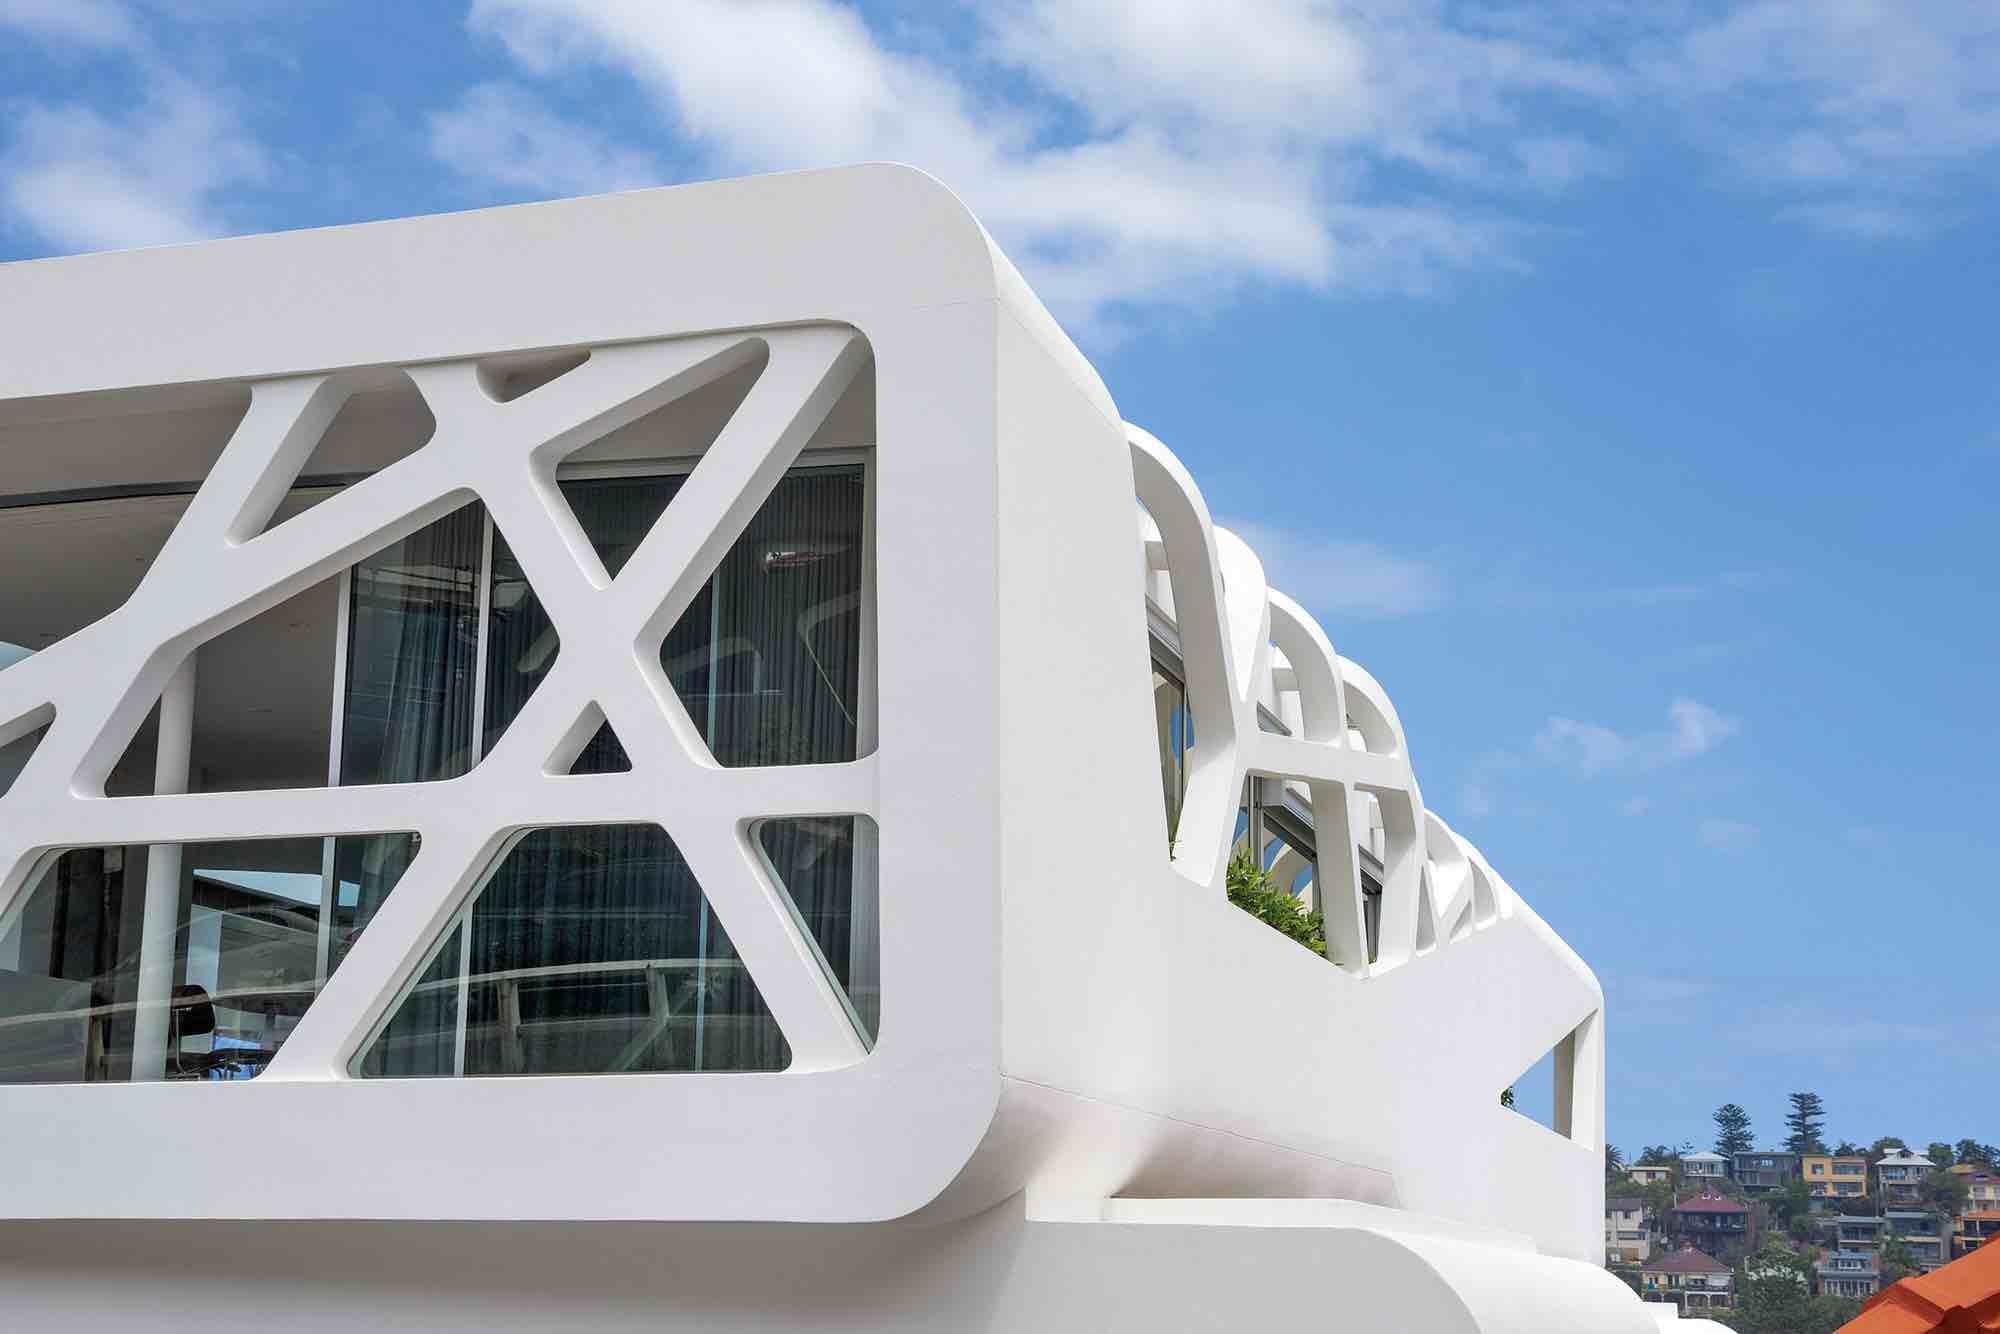 hewlett-street-house-mpr-design-group_hewlett_house02